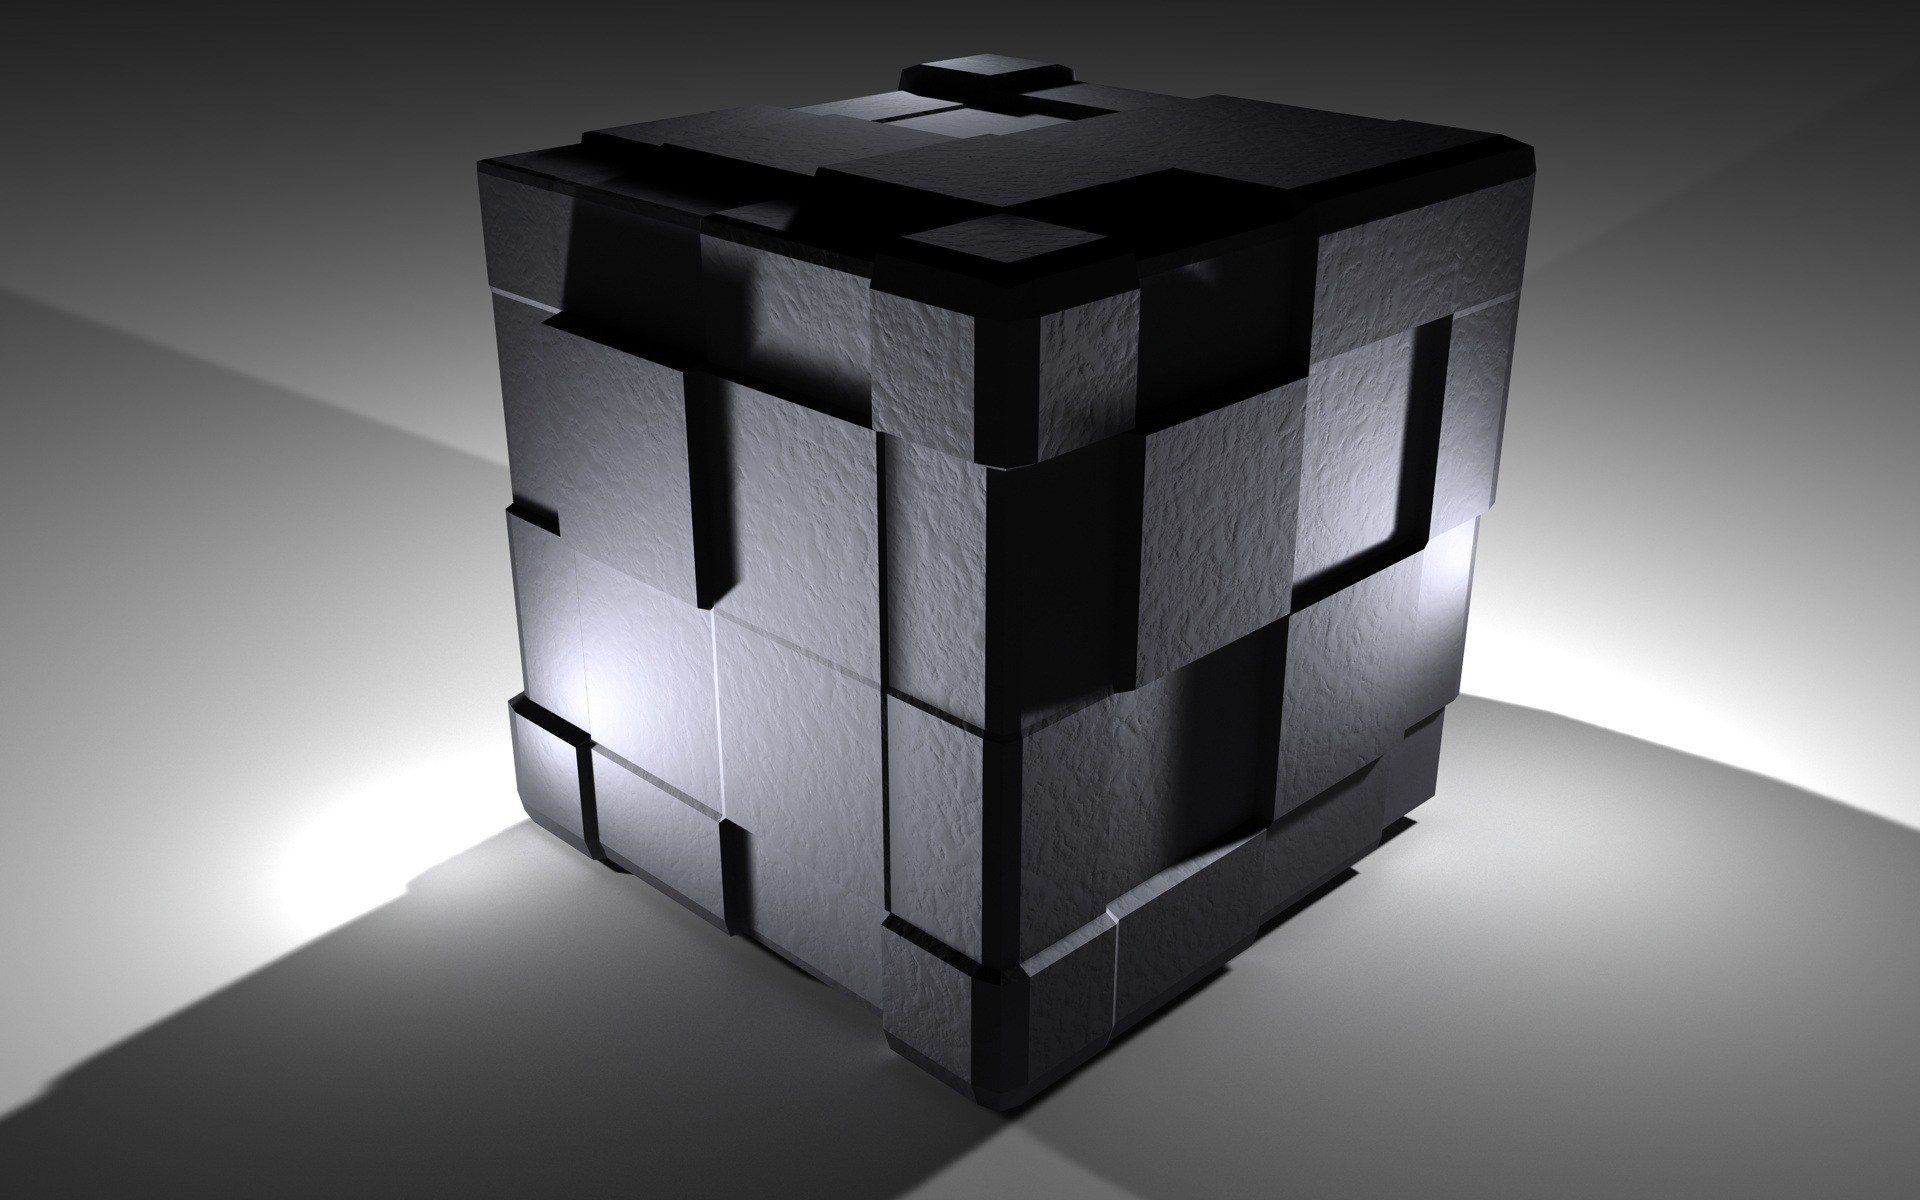 Cube 3d Wallpaper Abstract 3D